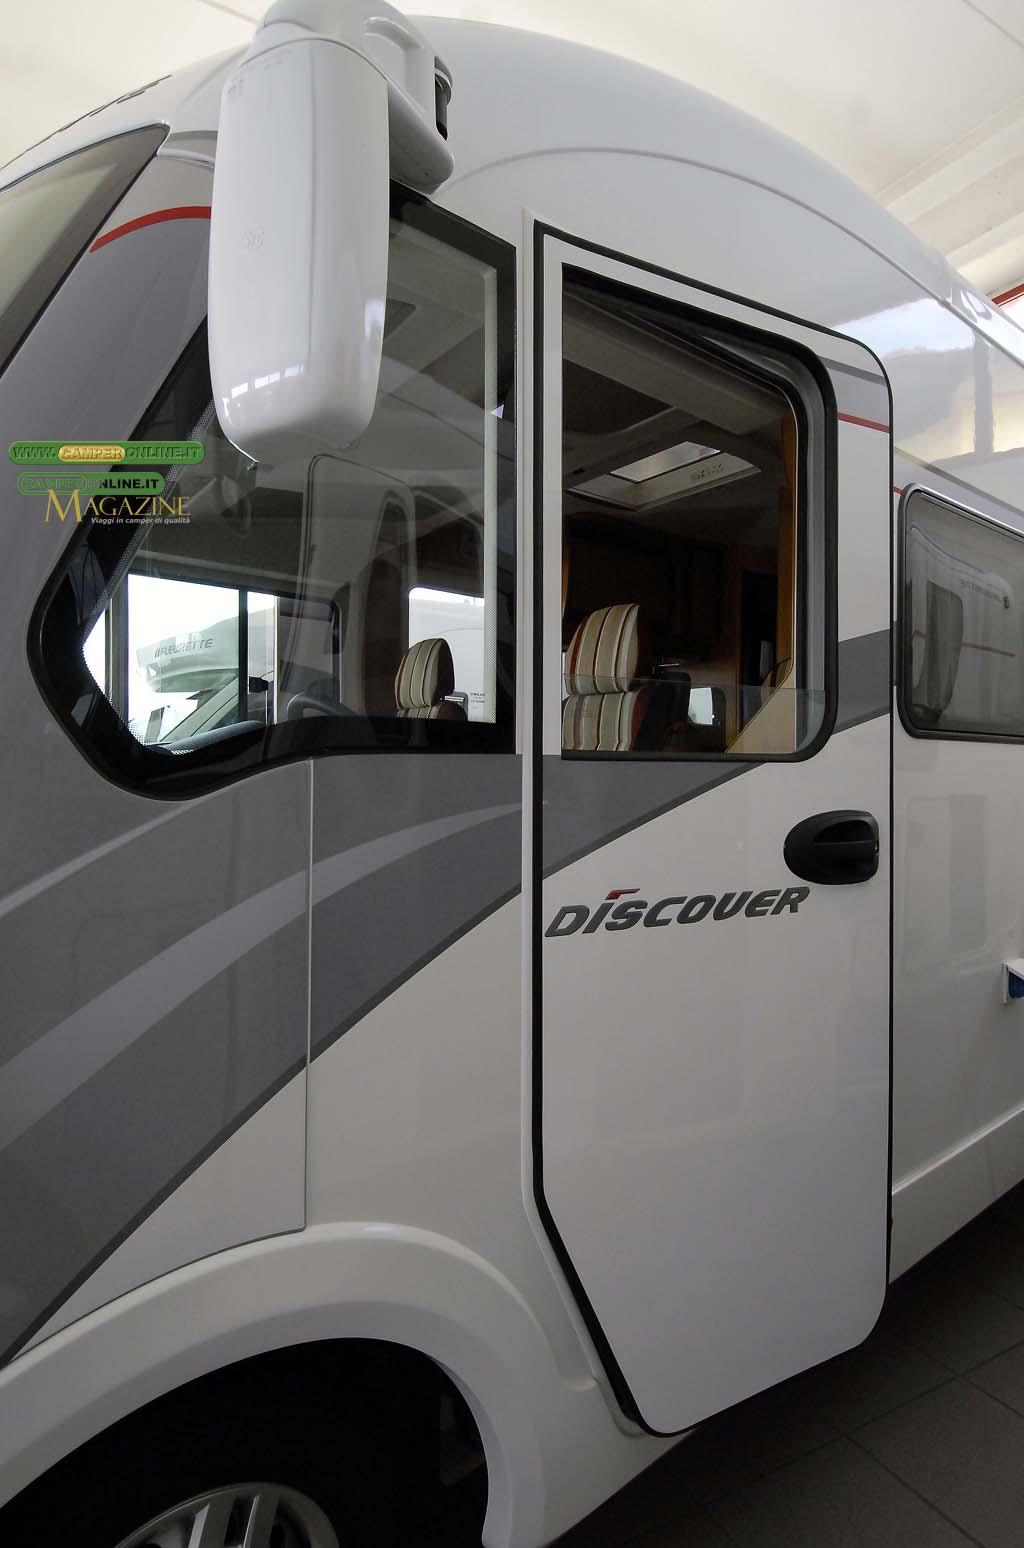 033a-Fleurette-Discover-65-LBM